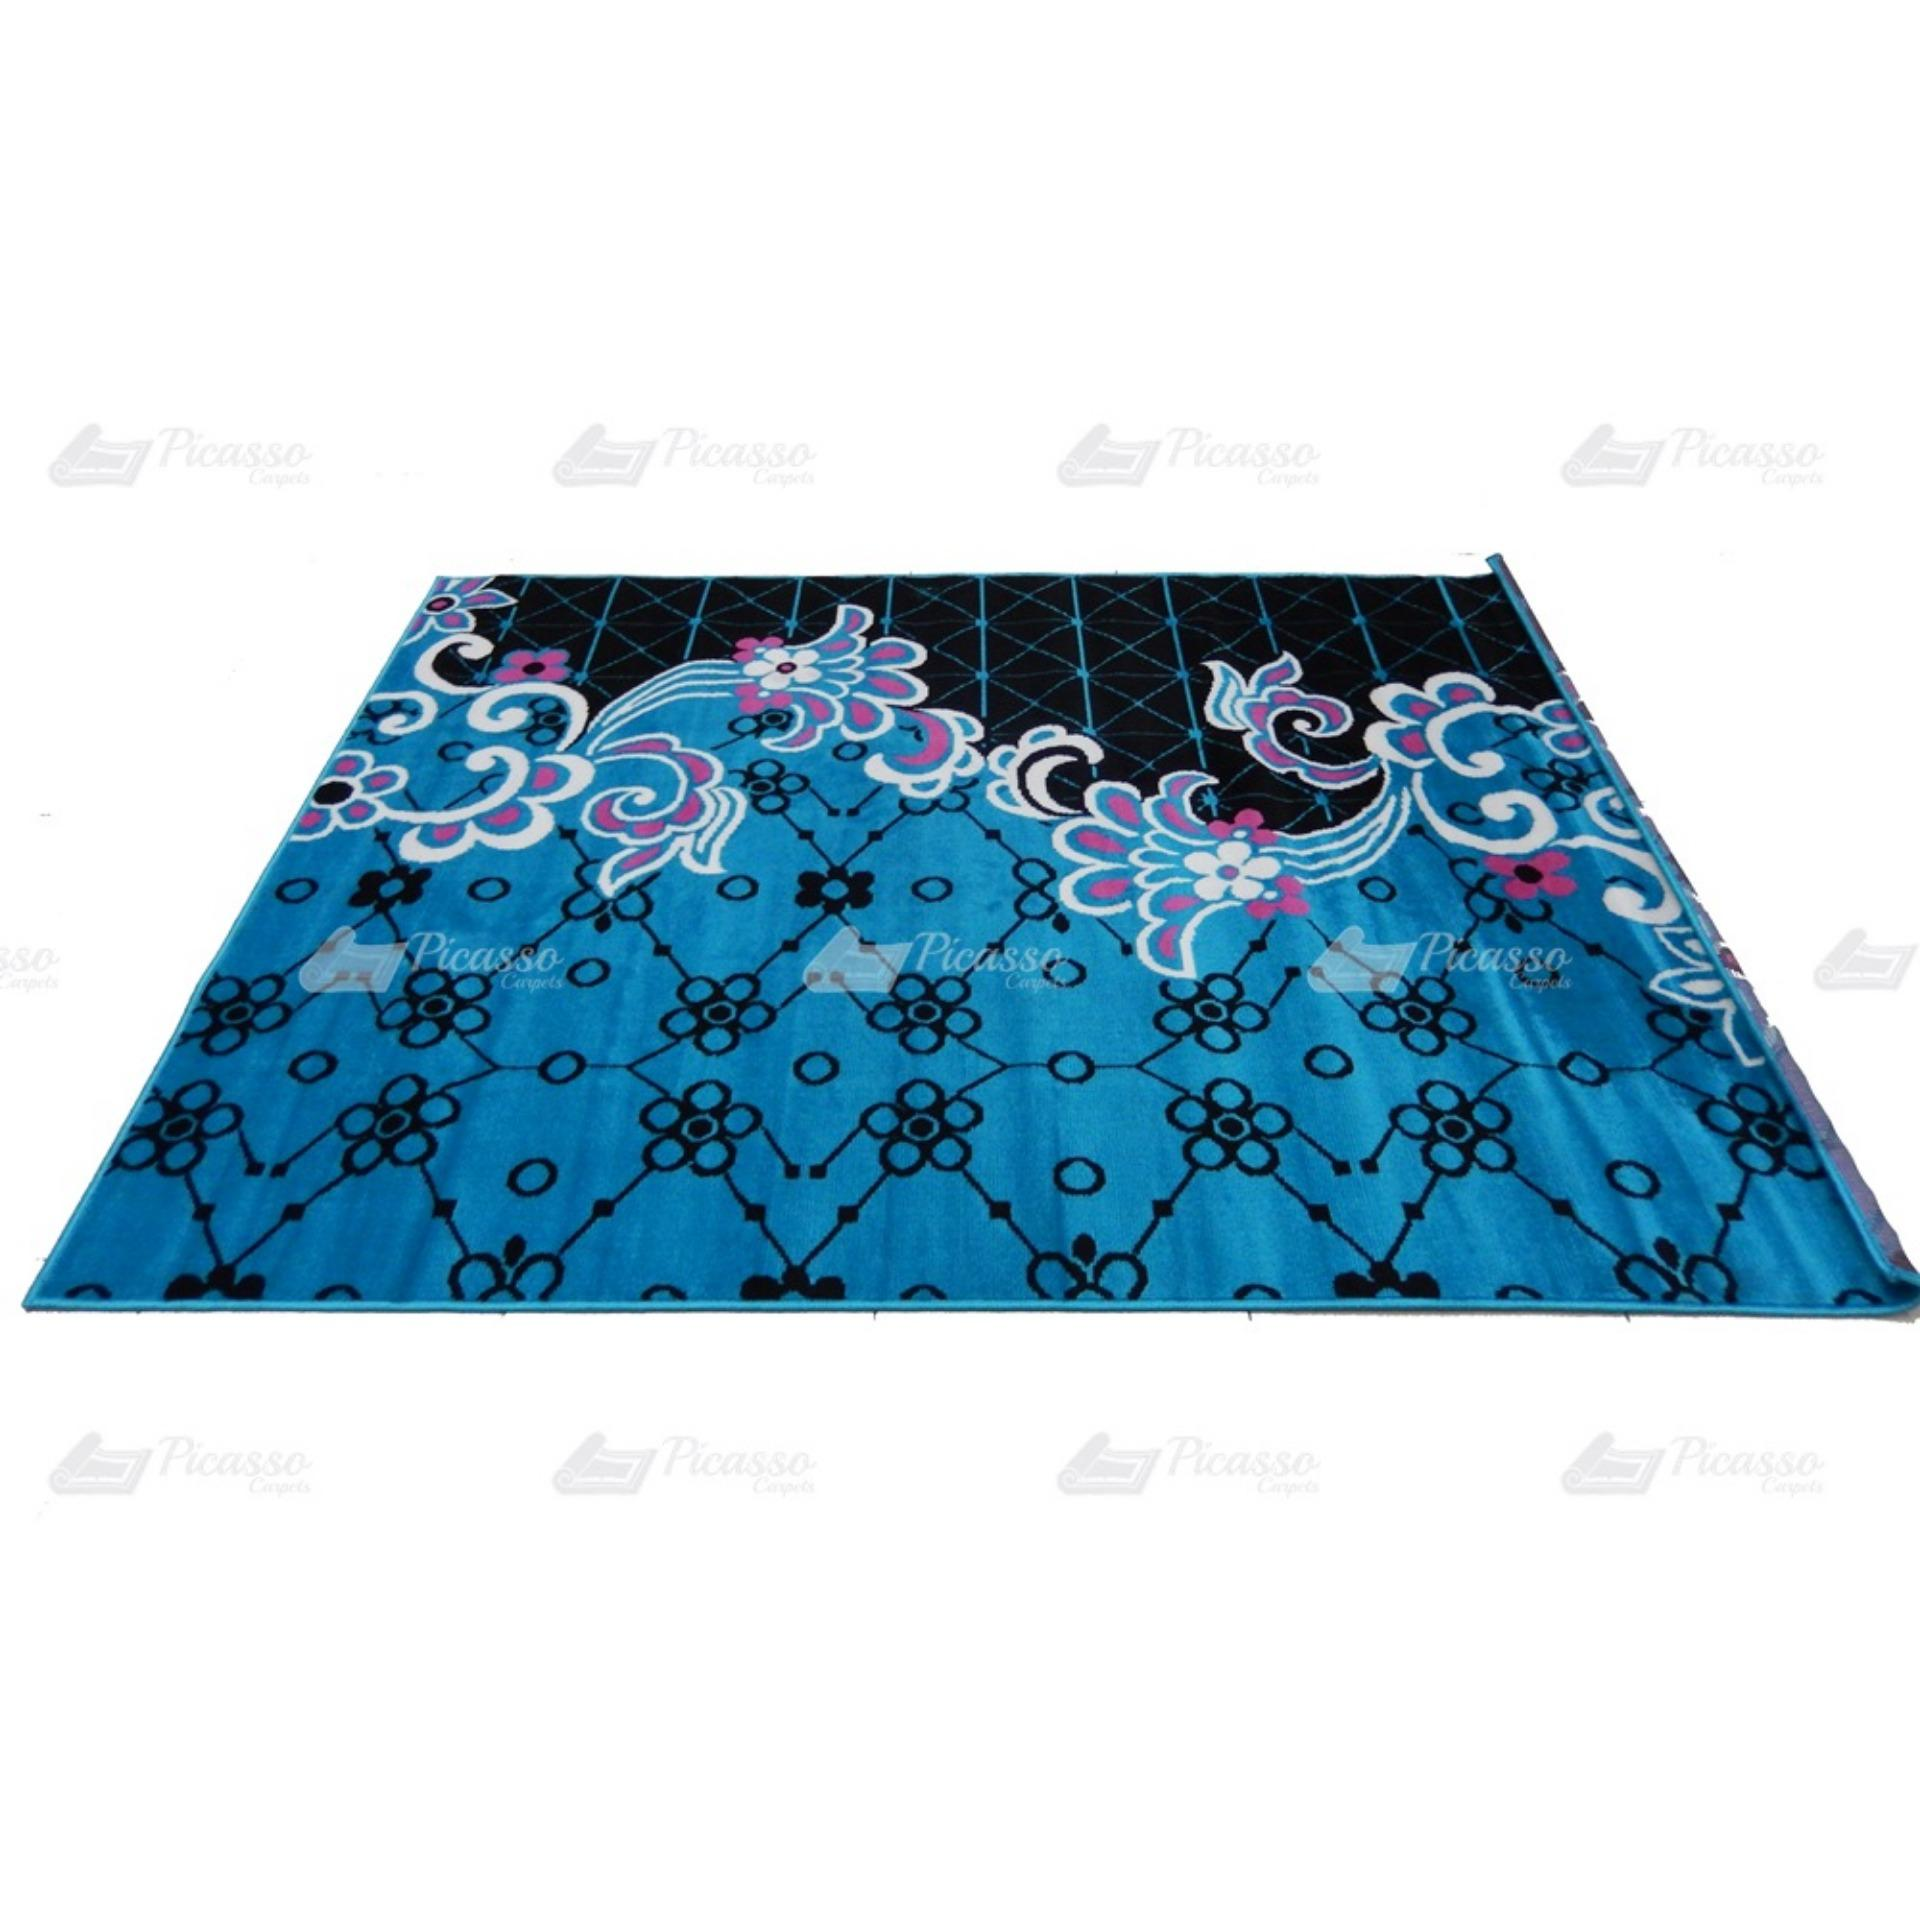 Fitur Termurah Karpet Moderno Uk 160 X 210 Azure 162066 Dan Harga Dompet Pria Kulit Asli Bifold Wallet Mens Import Branded  Ragazzo Dkr 006 3